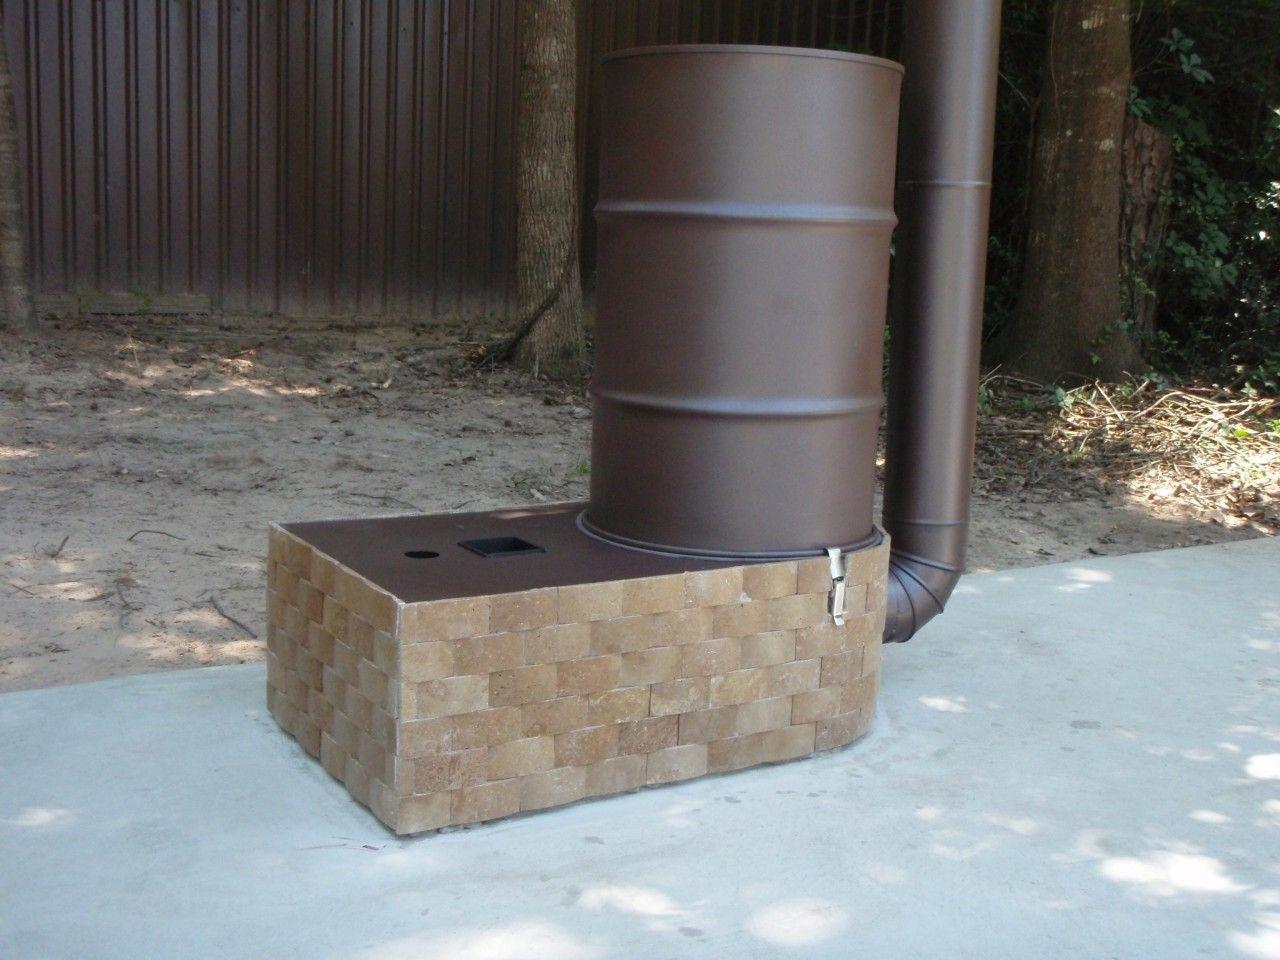 Tiled Dragon Heater Plans In 2019 Mud Hut Rocket